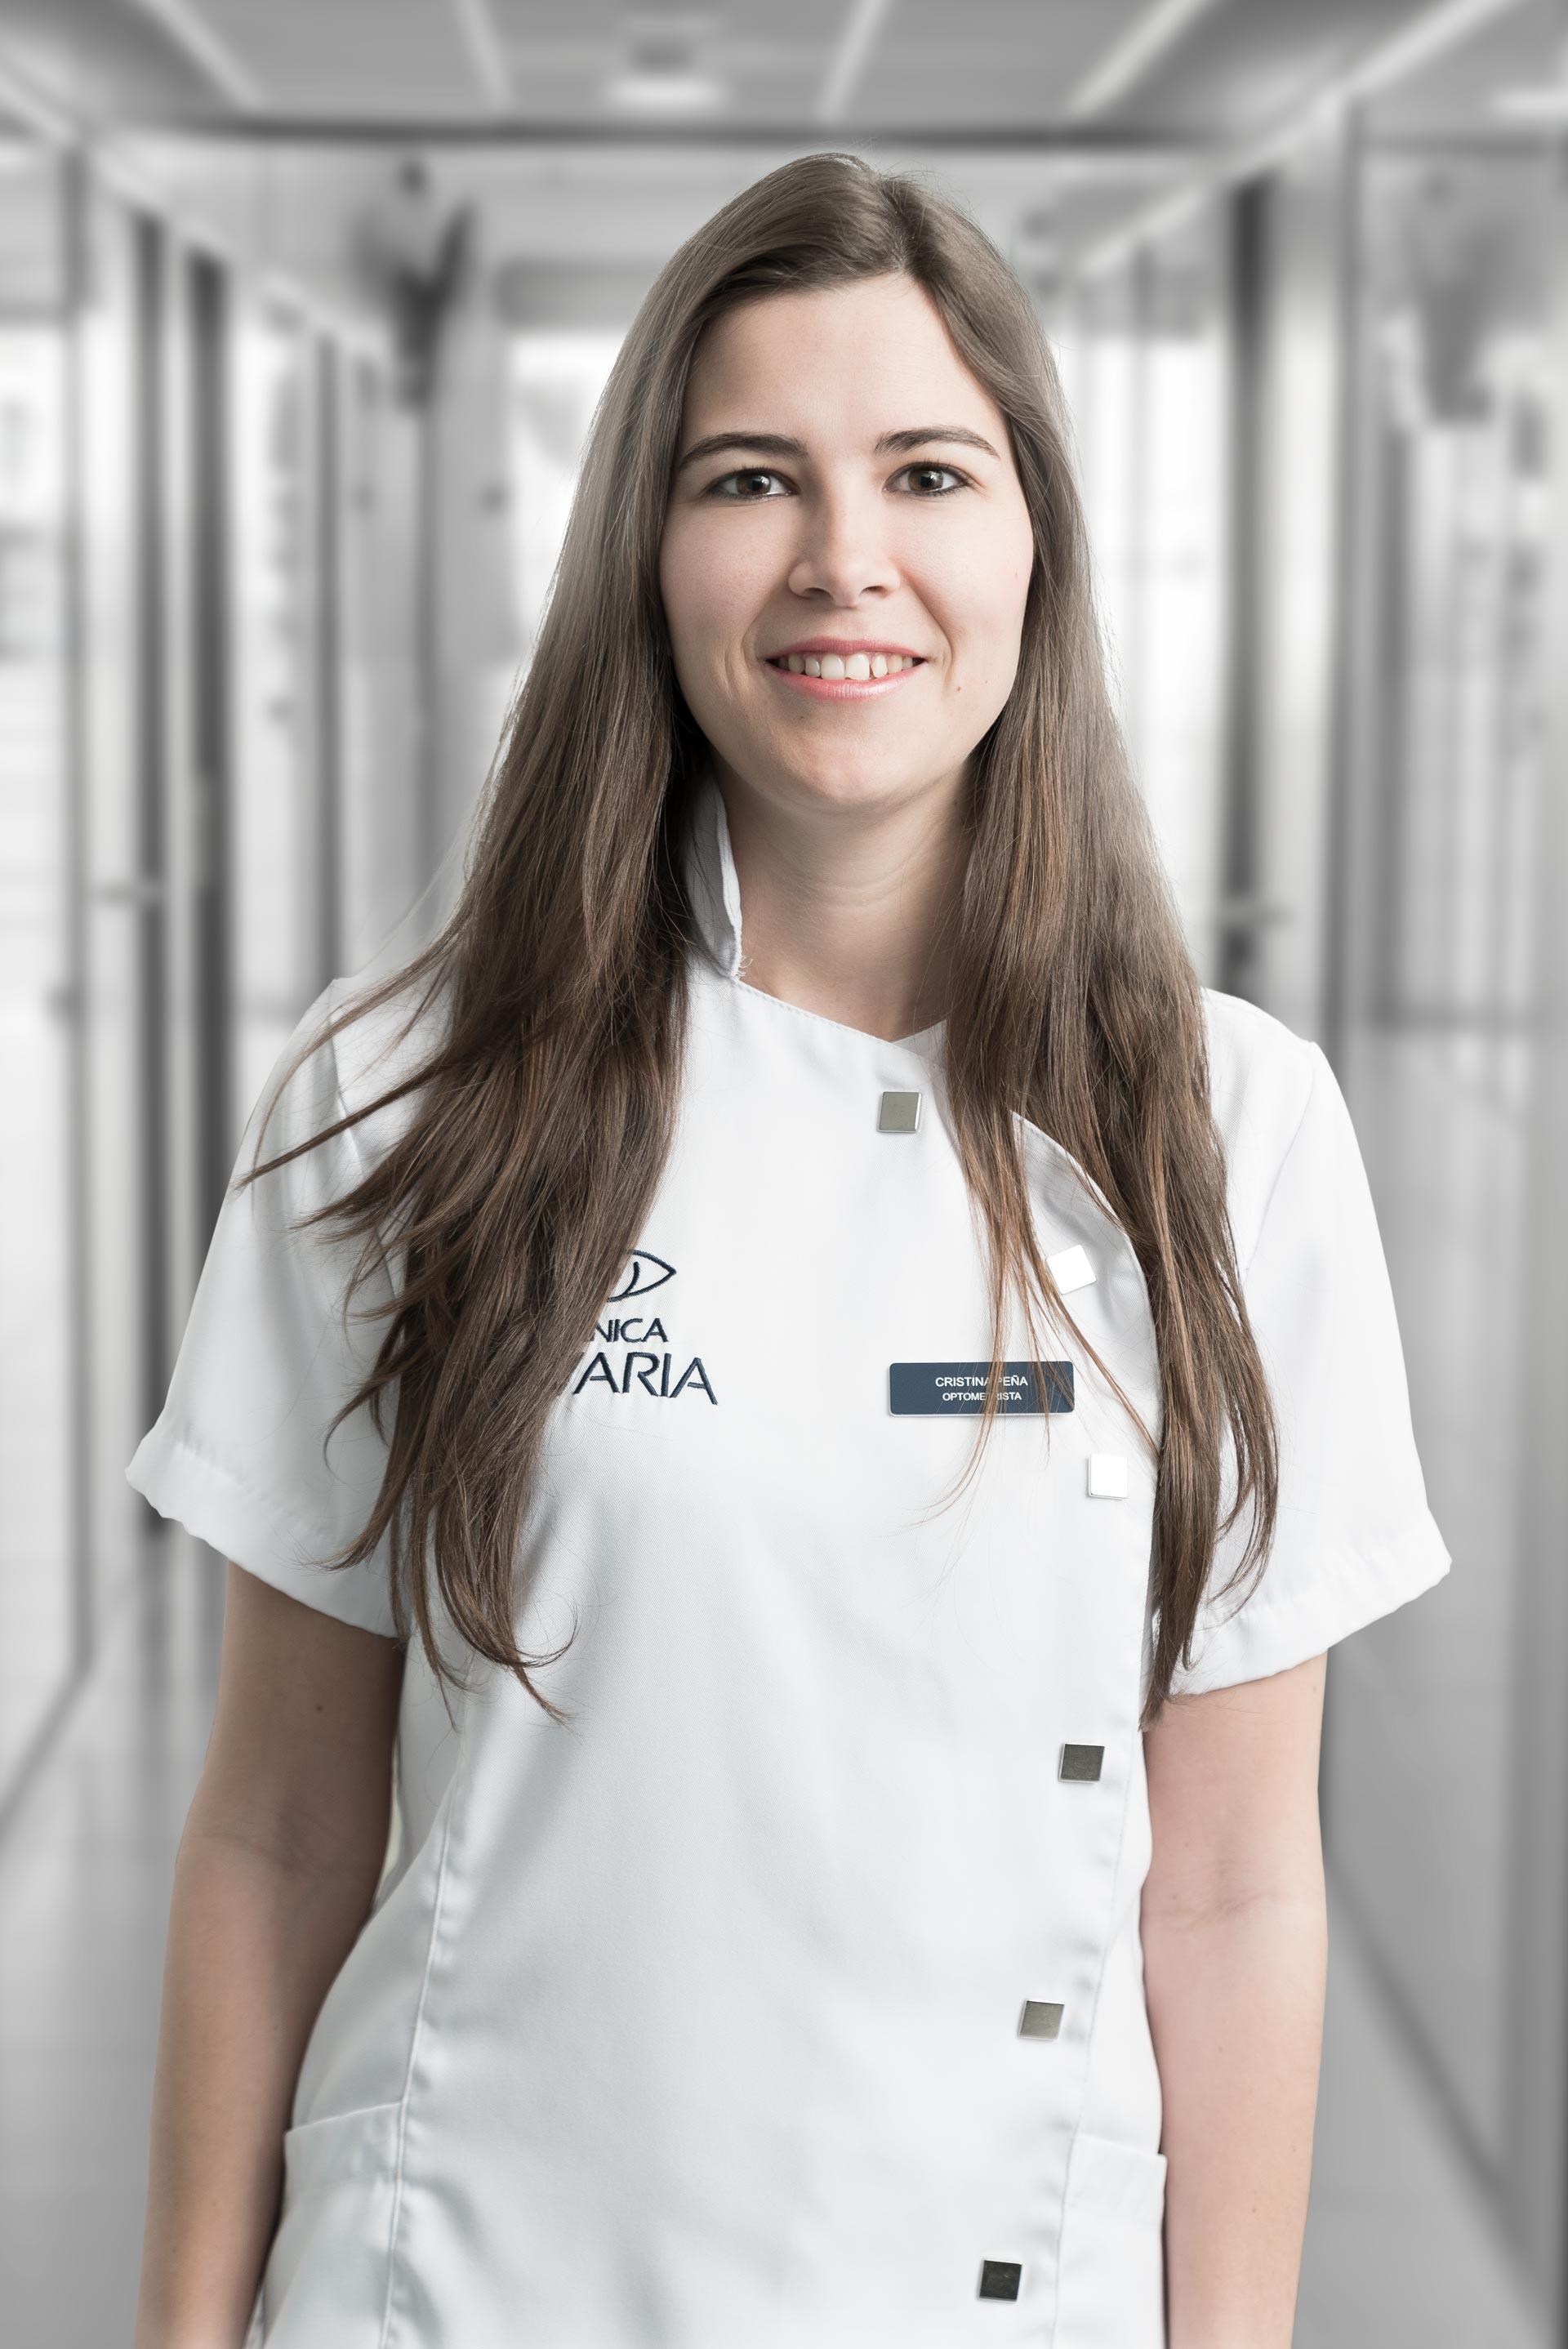 Cristina Peña Betancor